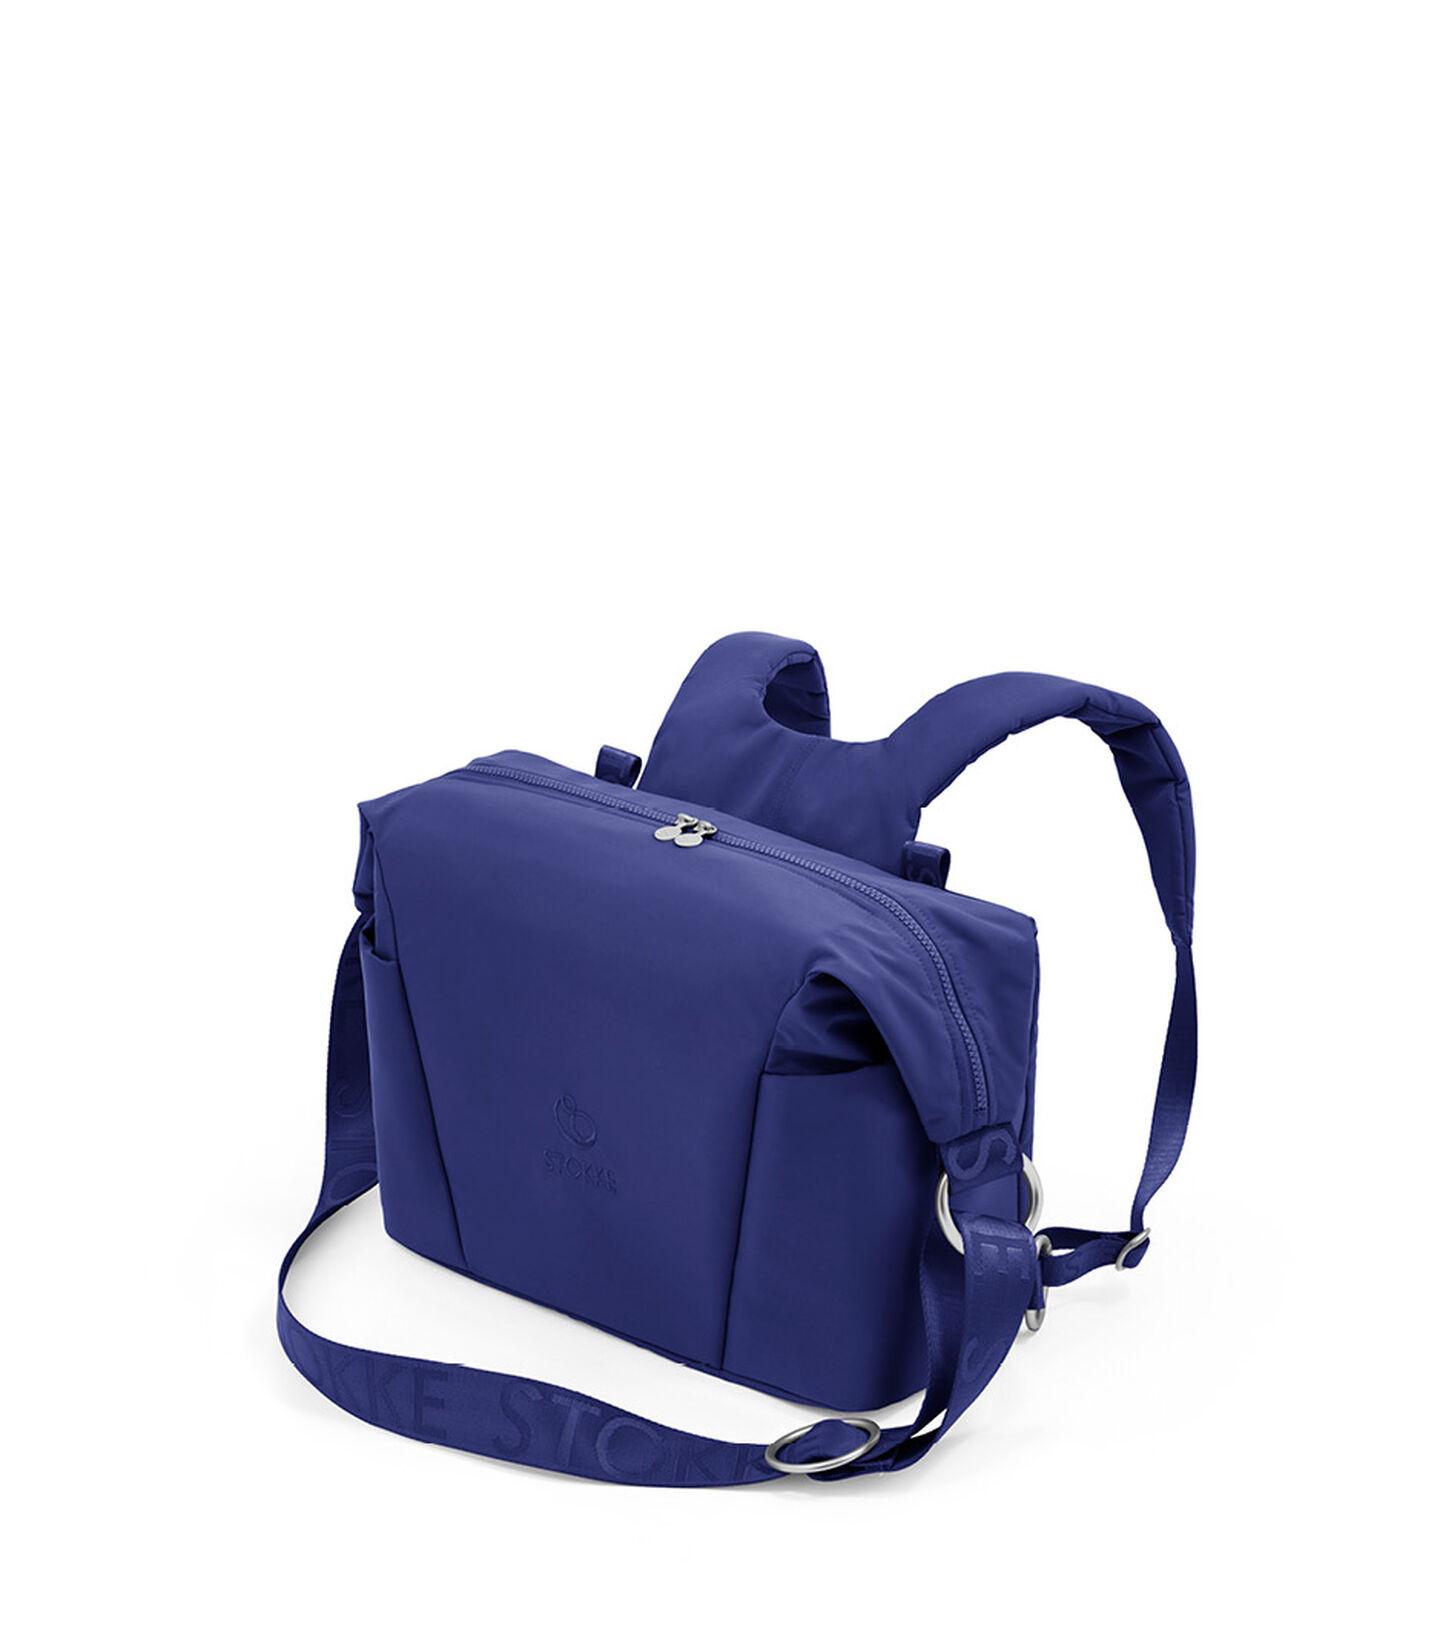 Bolso cambiador Stokke® Xplory® X Azul Real, Azul Real, mainview view 1